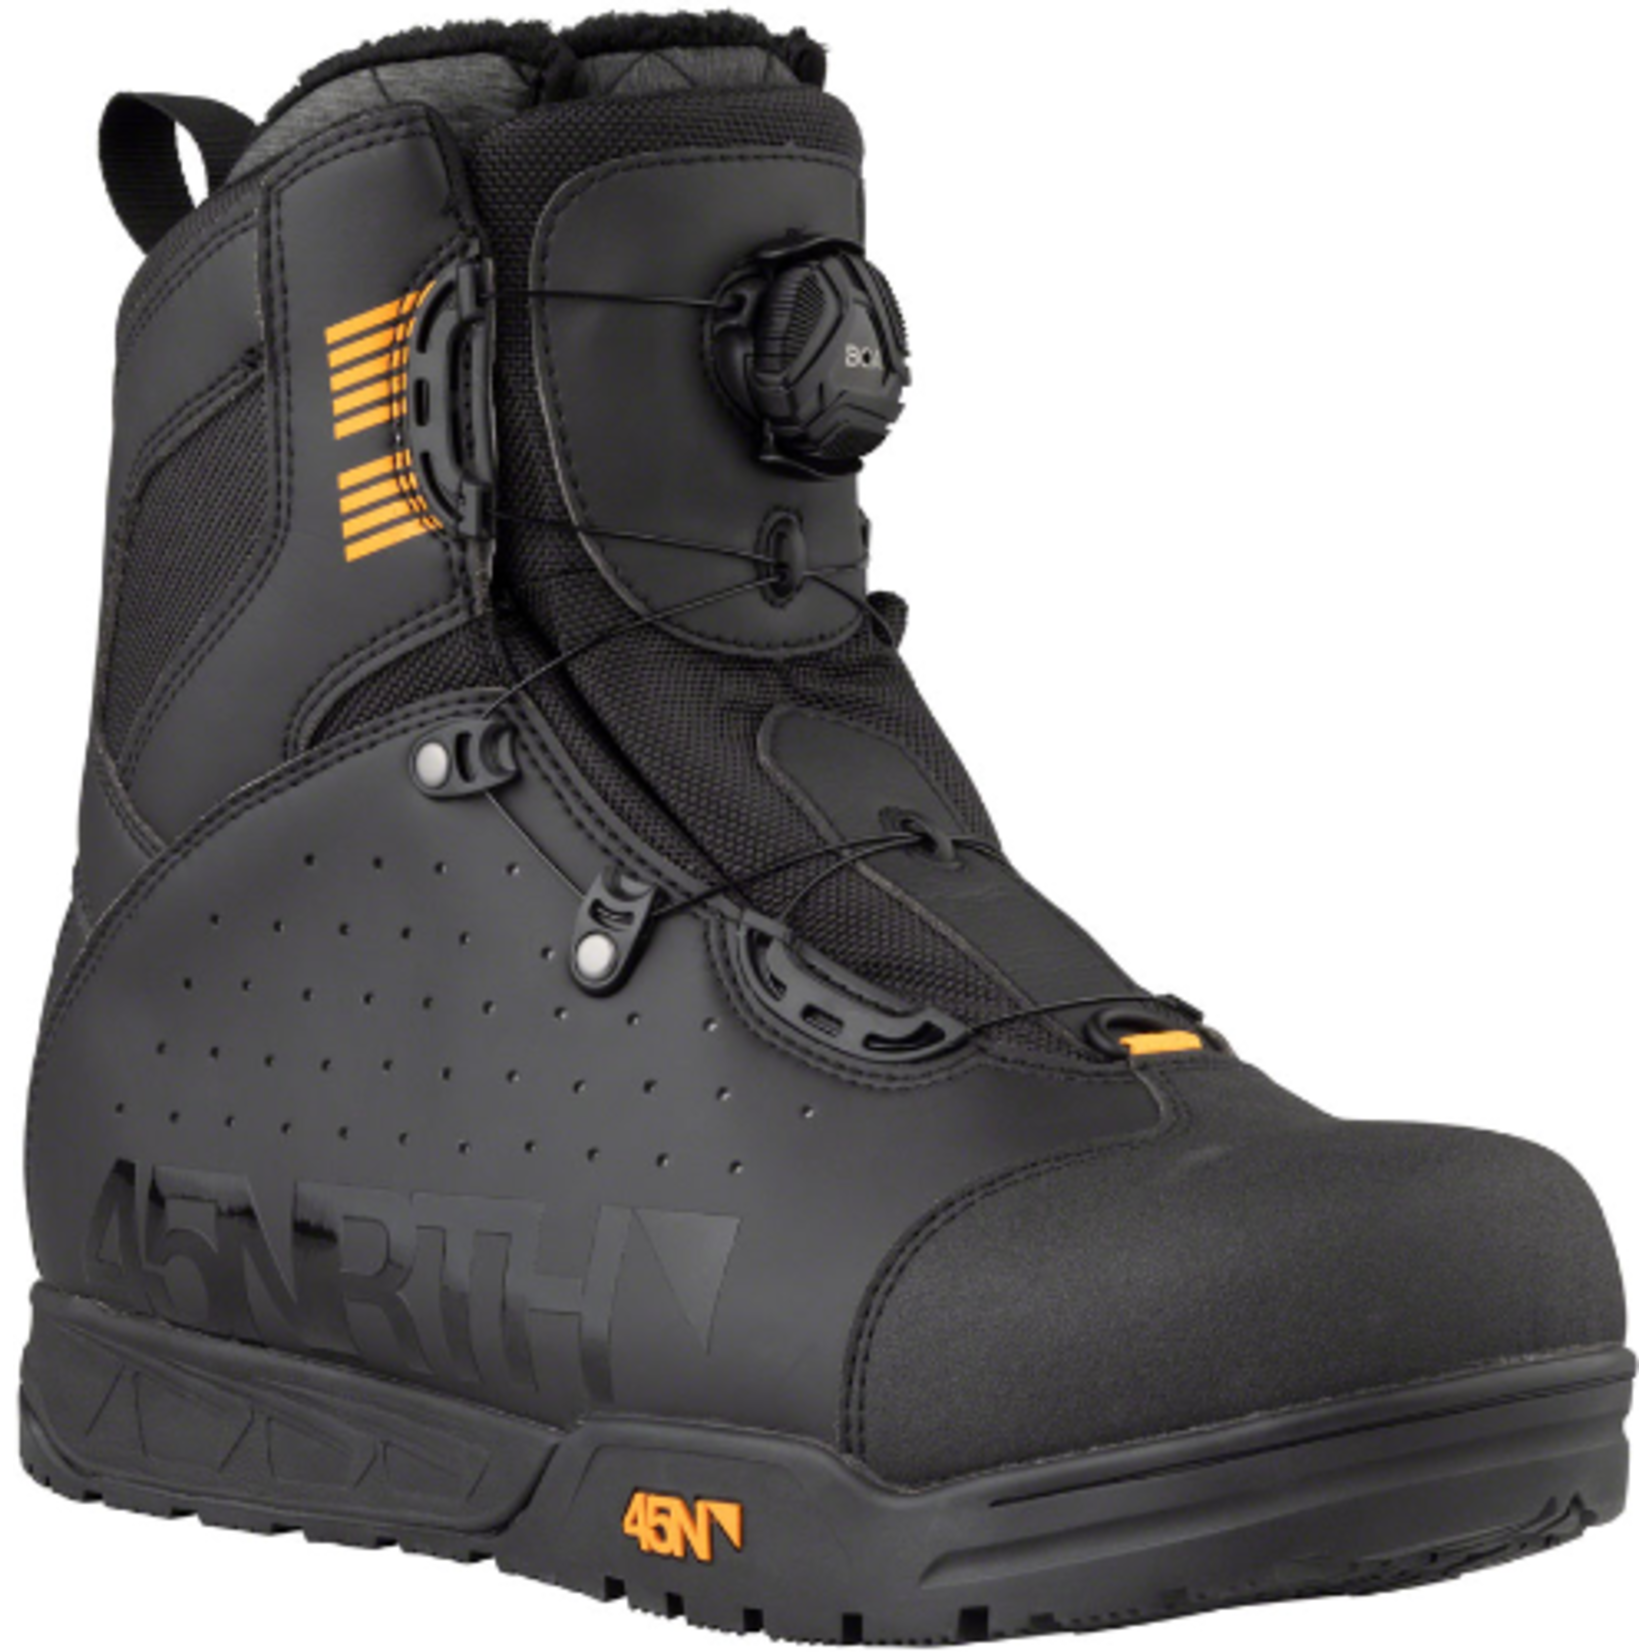 45NRTH 45NRTH Wolvhammer Boot BOA Black